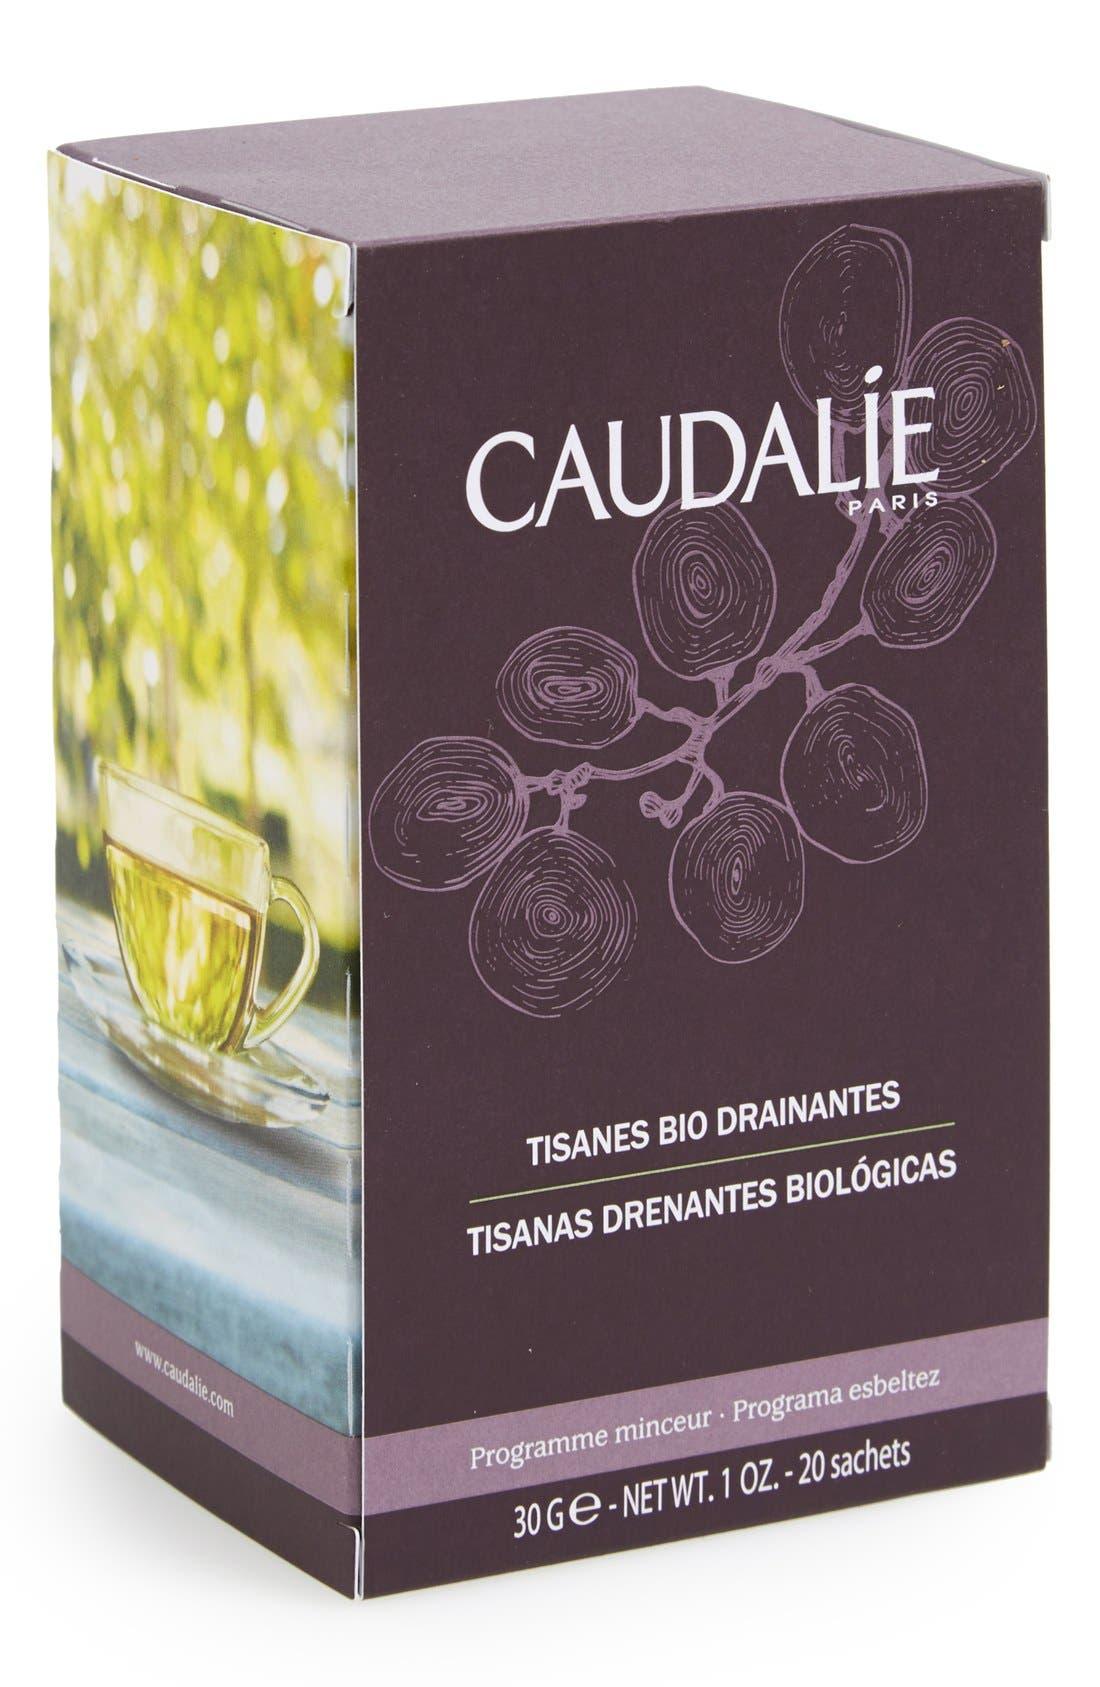 CAUDALÍE Draining Organic Herbal Teas